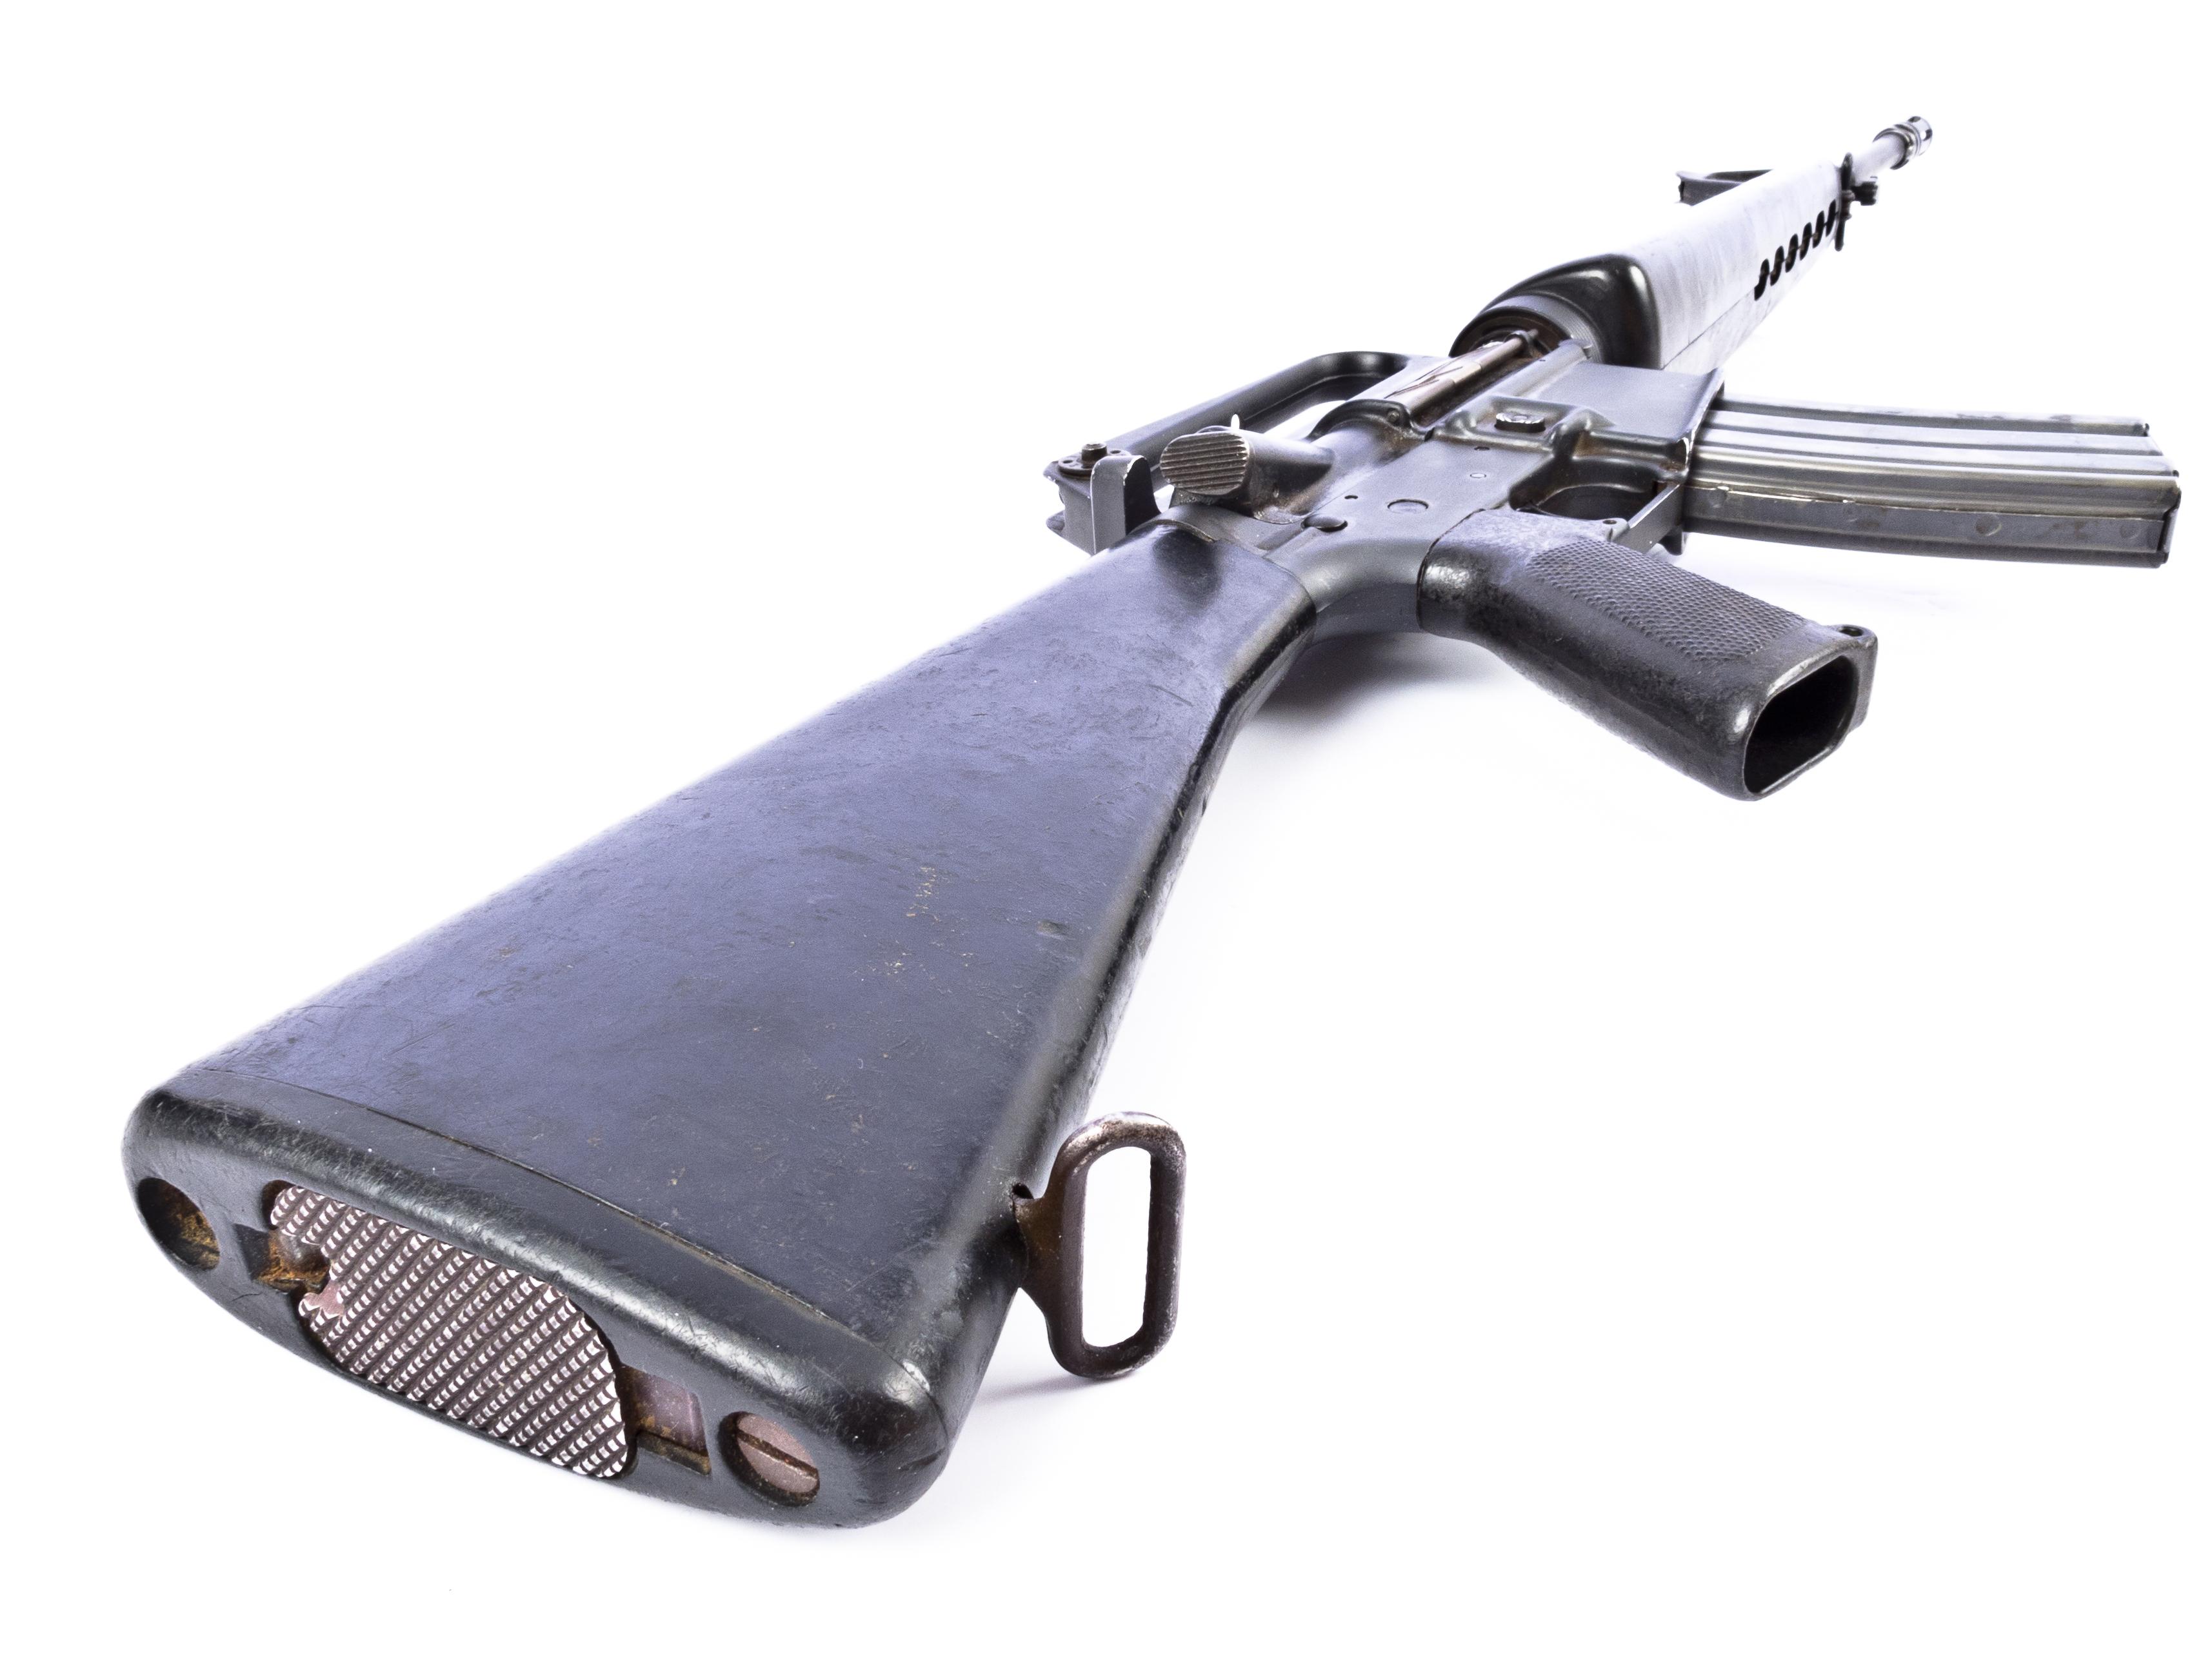 Automatic machine gun